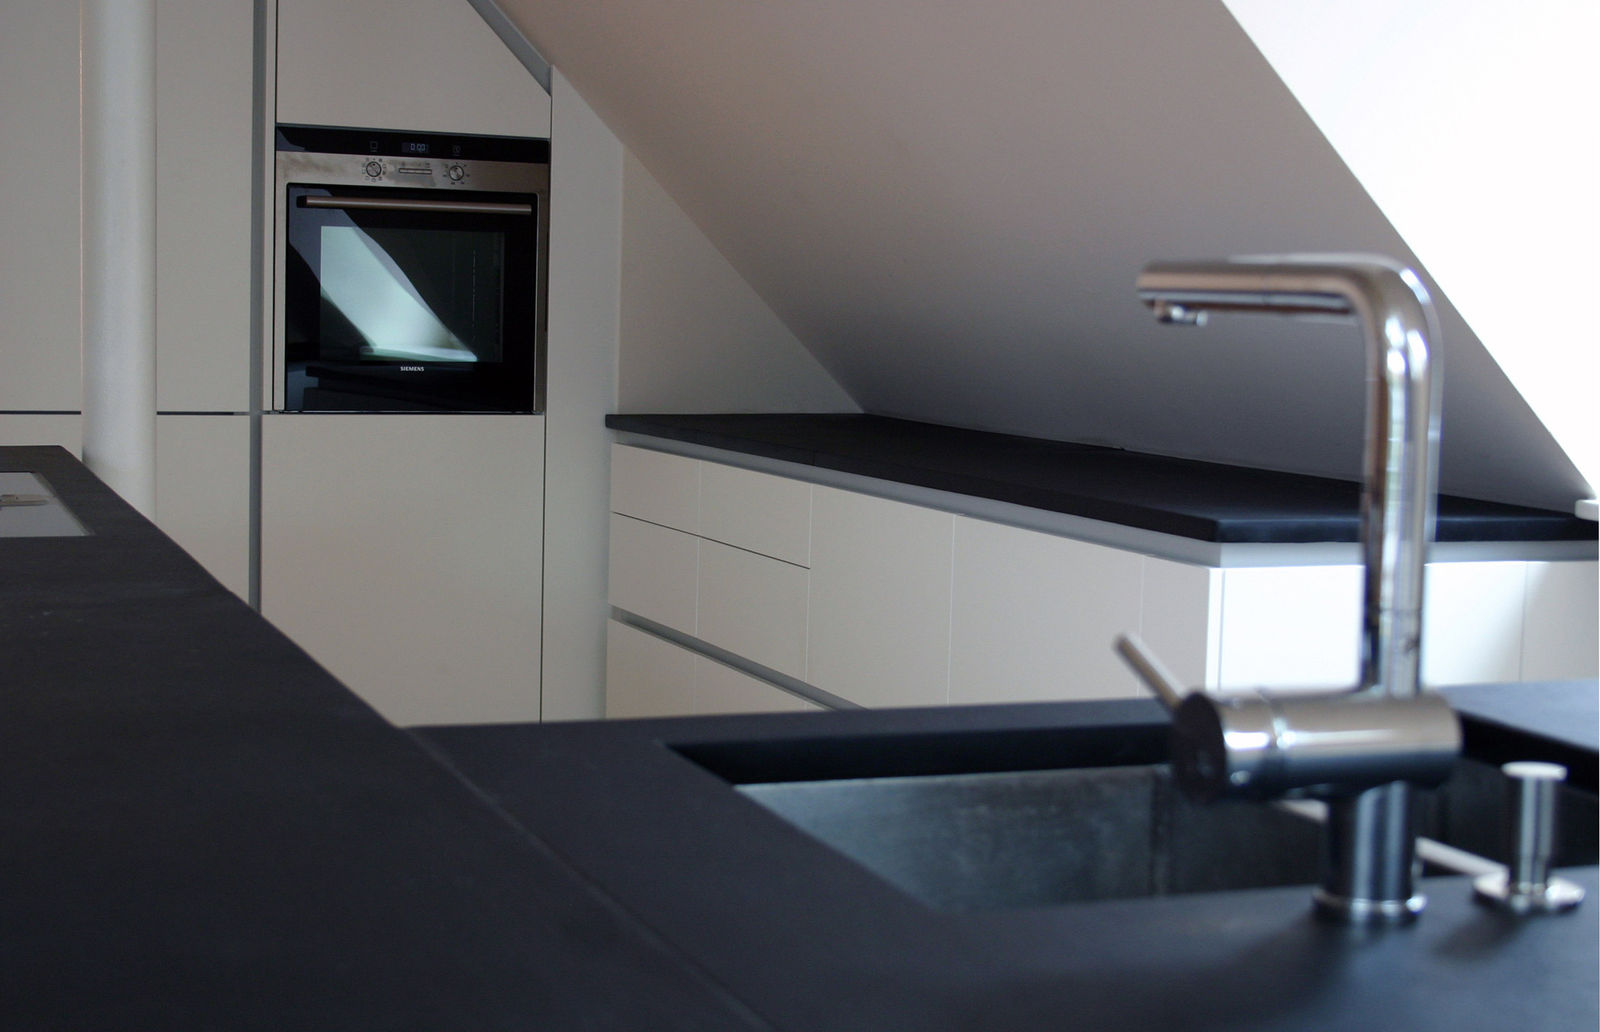 Full Size of Küche Dachgeschoss Ausstellungsstück Edelstahlküche Eckküche Mit Elektrogeräten Pantryküche Kühlschrank Wandpaneel Glas Vorratsschrank Mischbatterie Wohnzimmer Küche Dachgeschoss